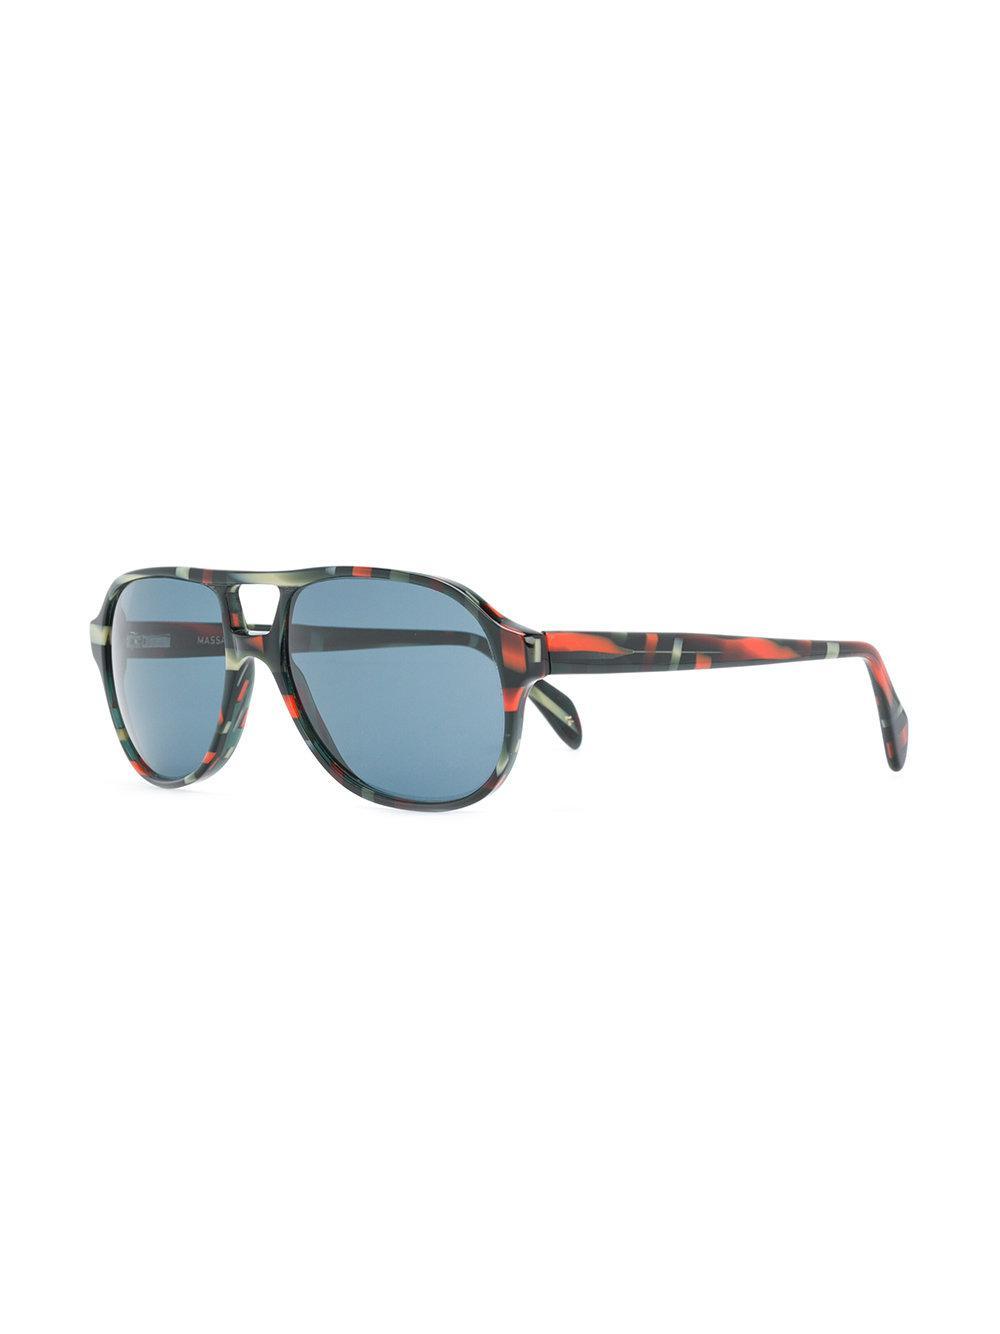 Lgr Patterned Aviator Sunglasses in Blue